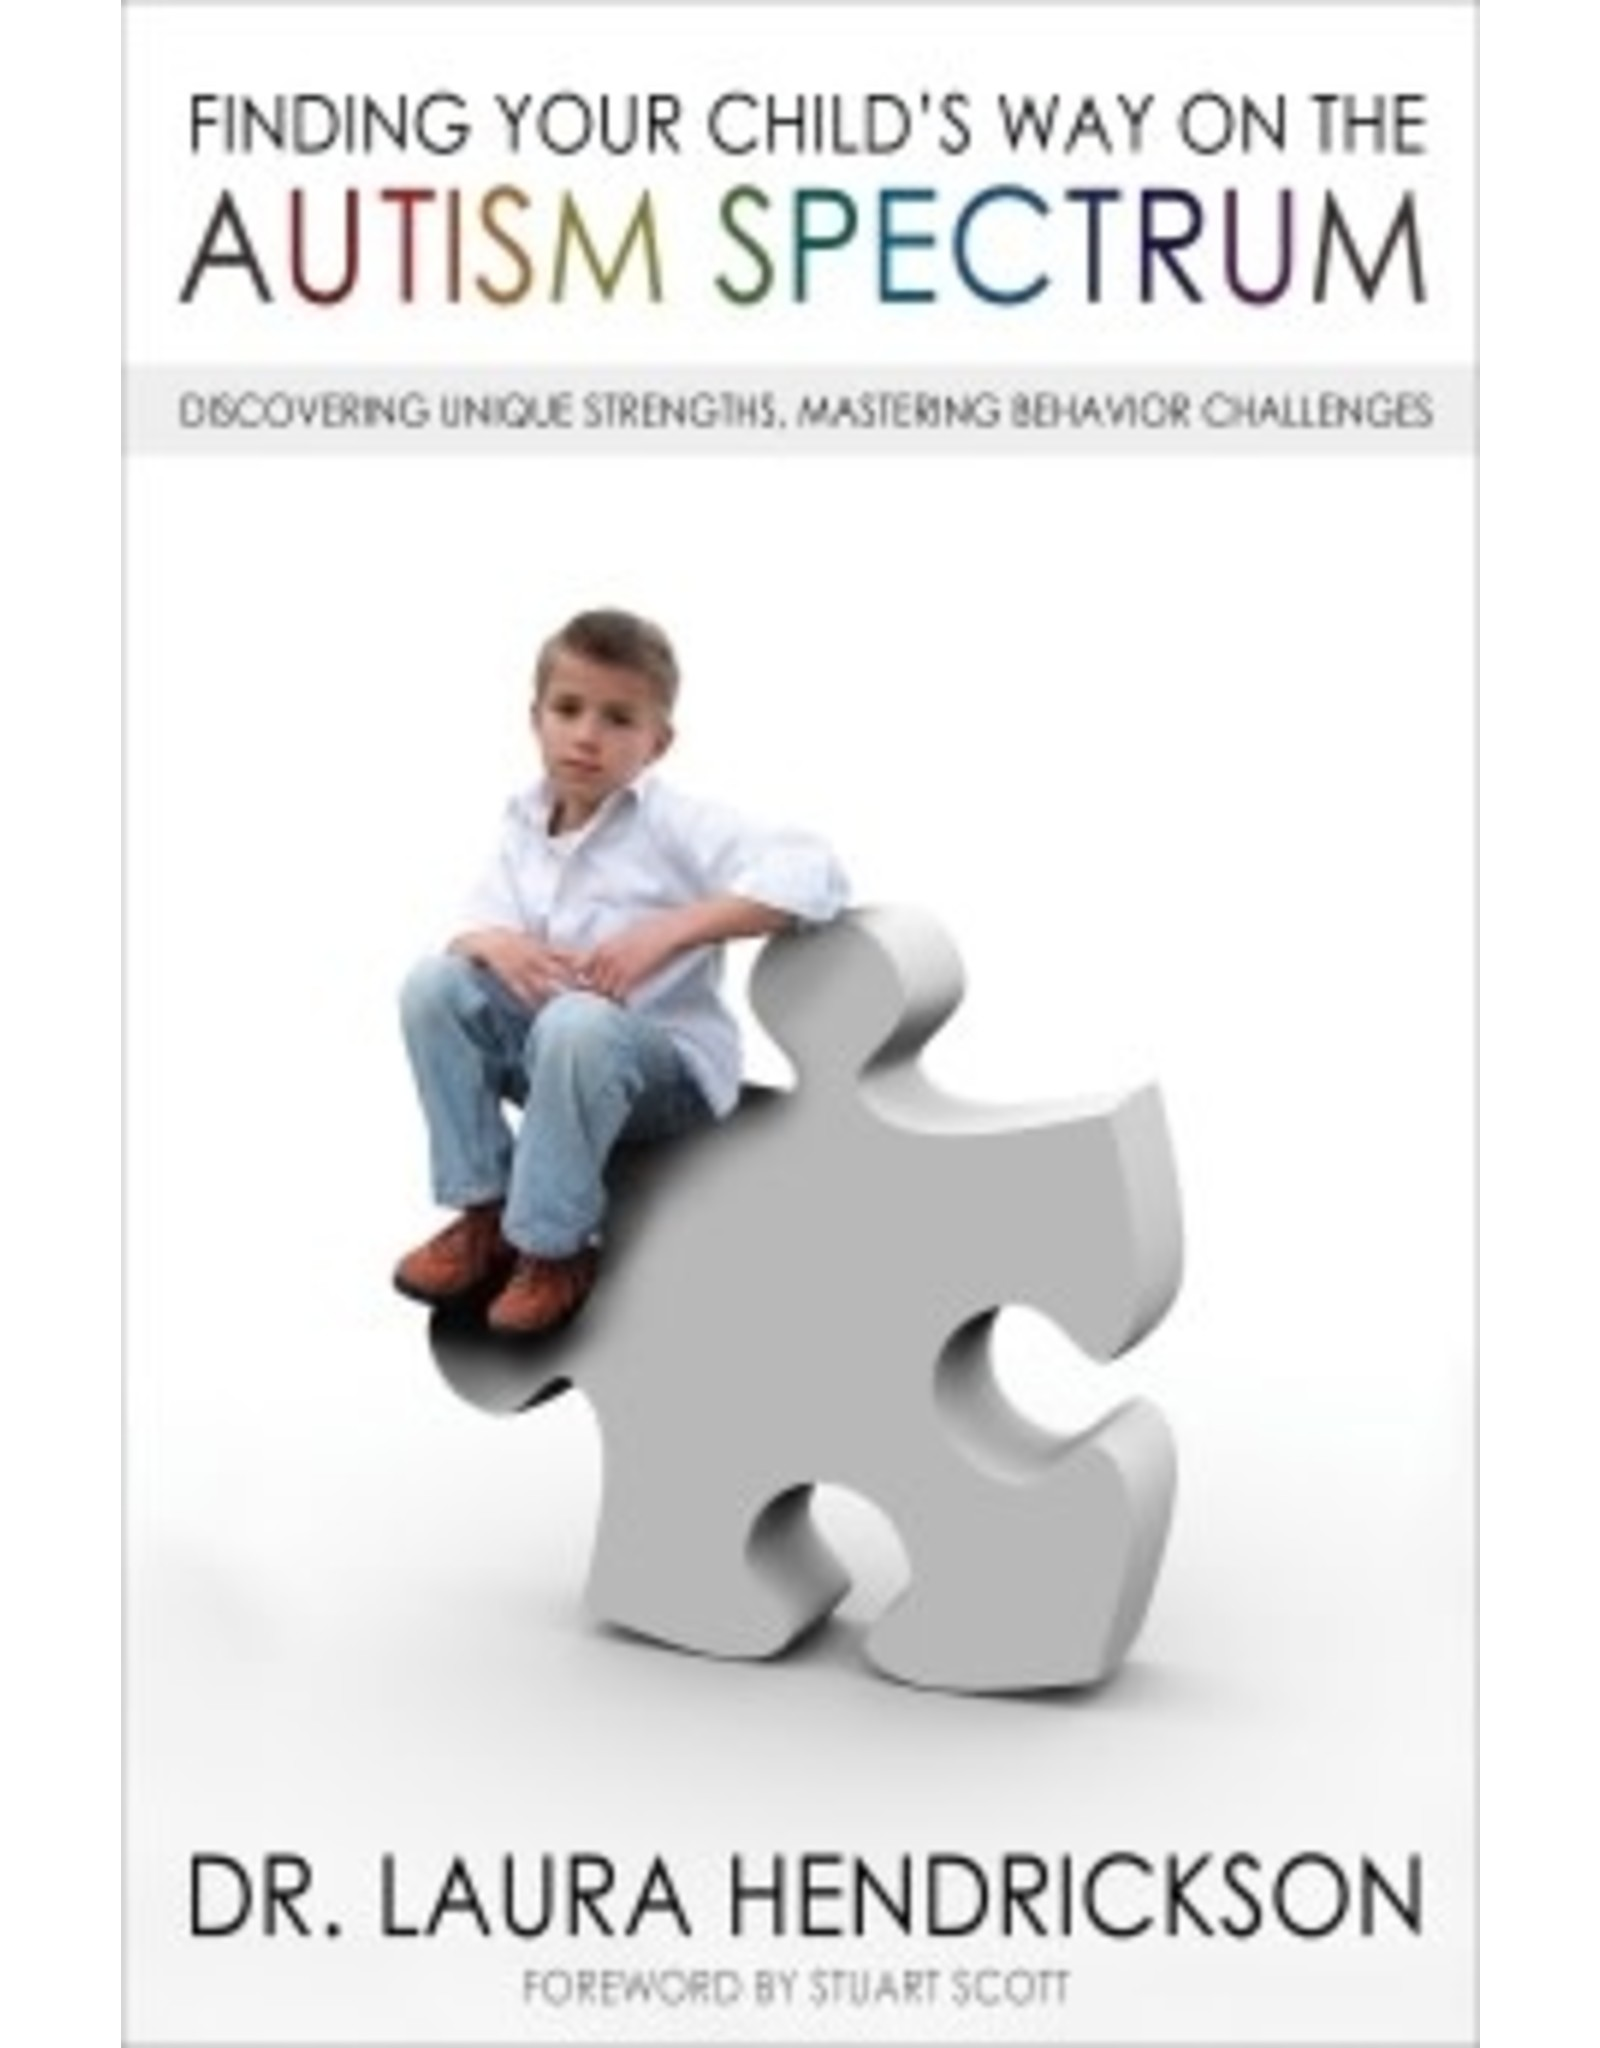 Hendrickson Autism Spectrum